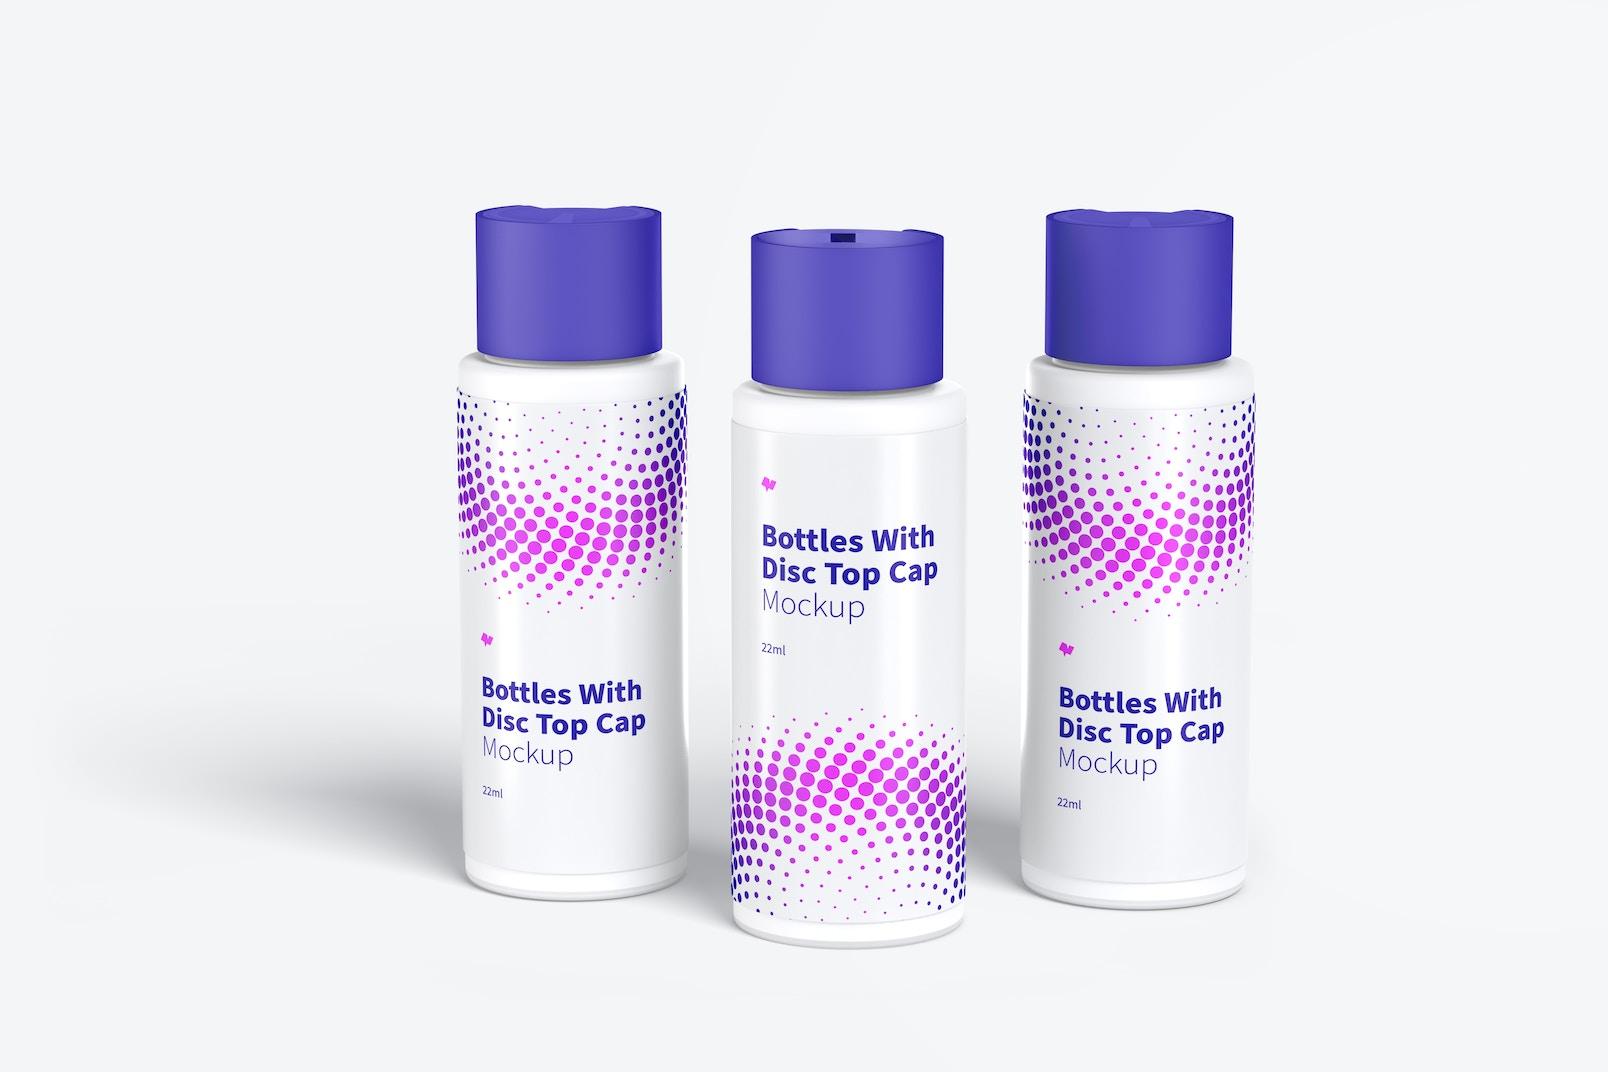 22ml Plastic Bottles With Disc Top Cap Mockup